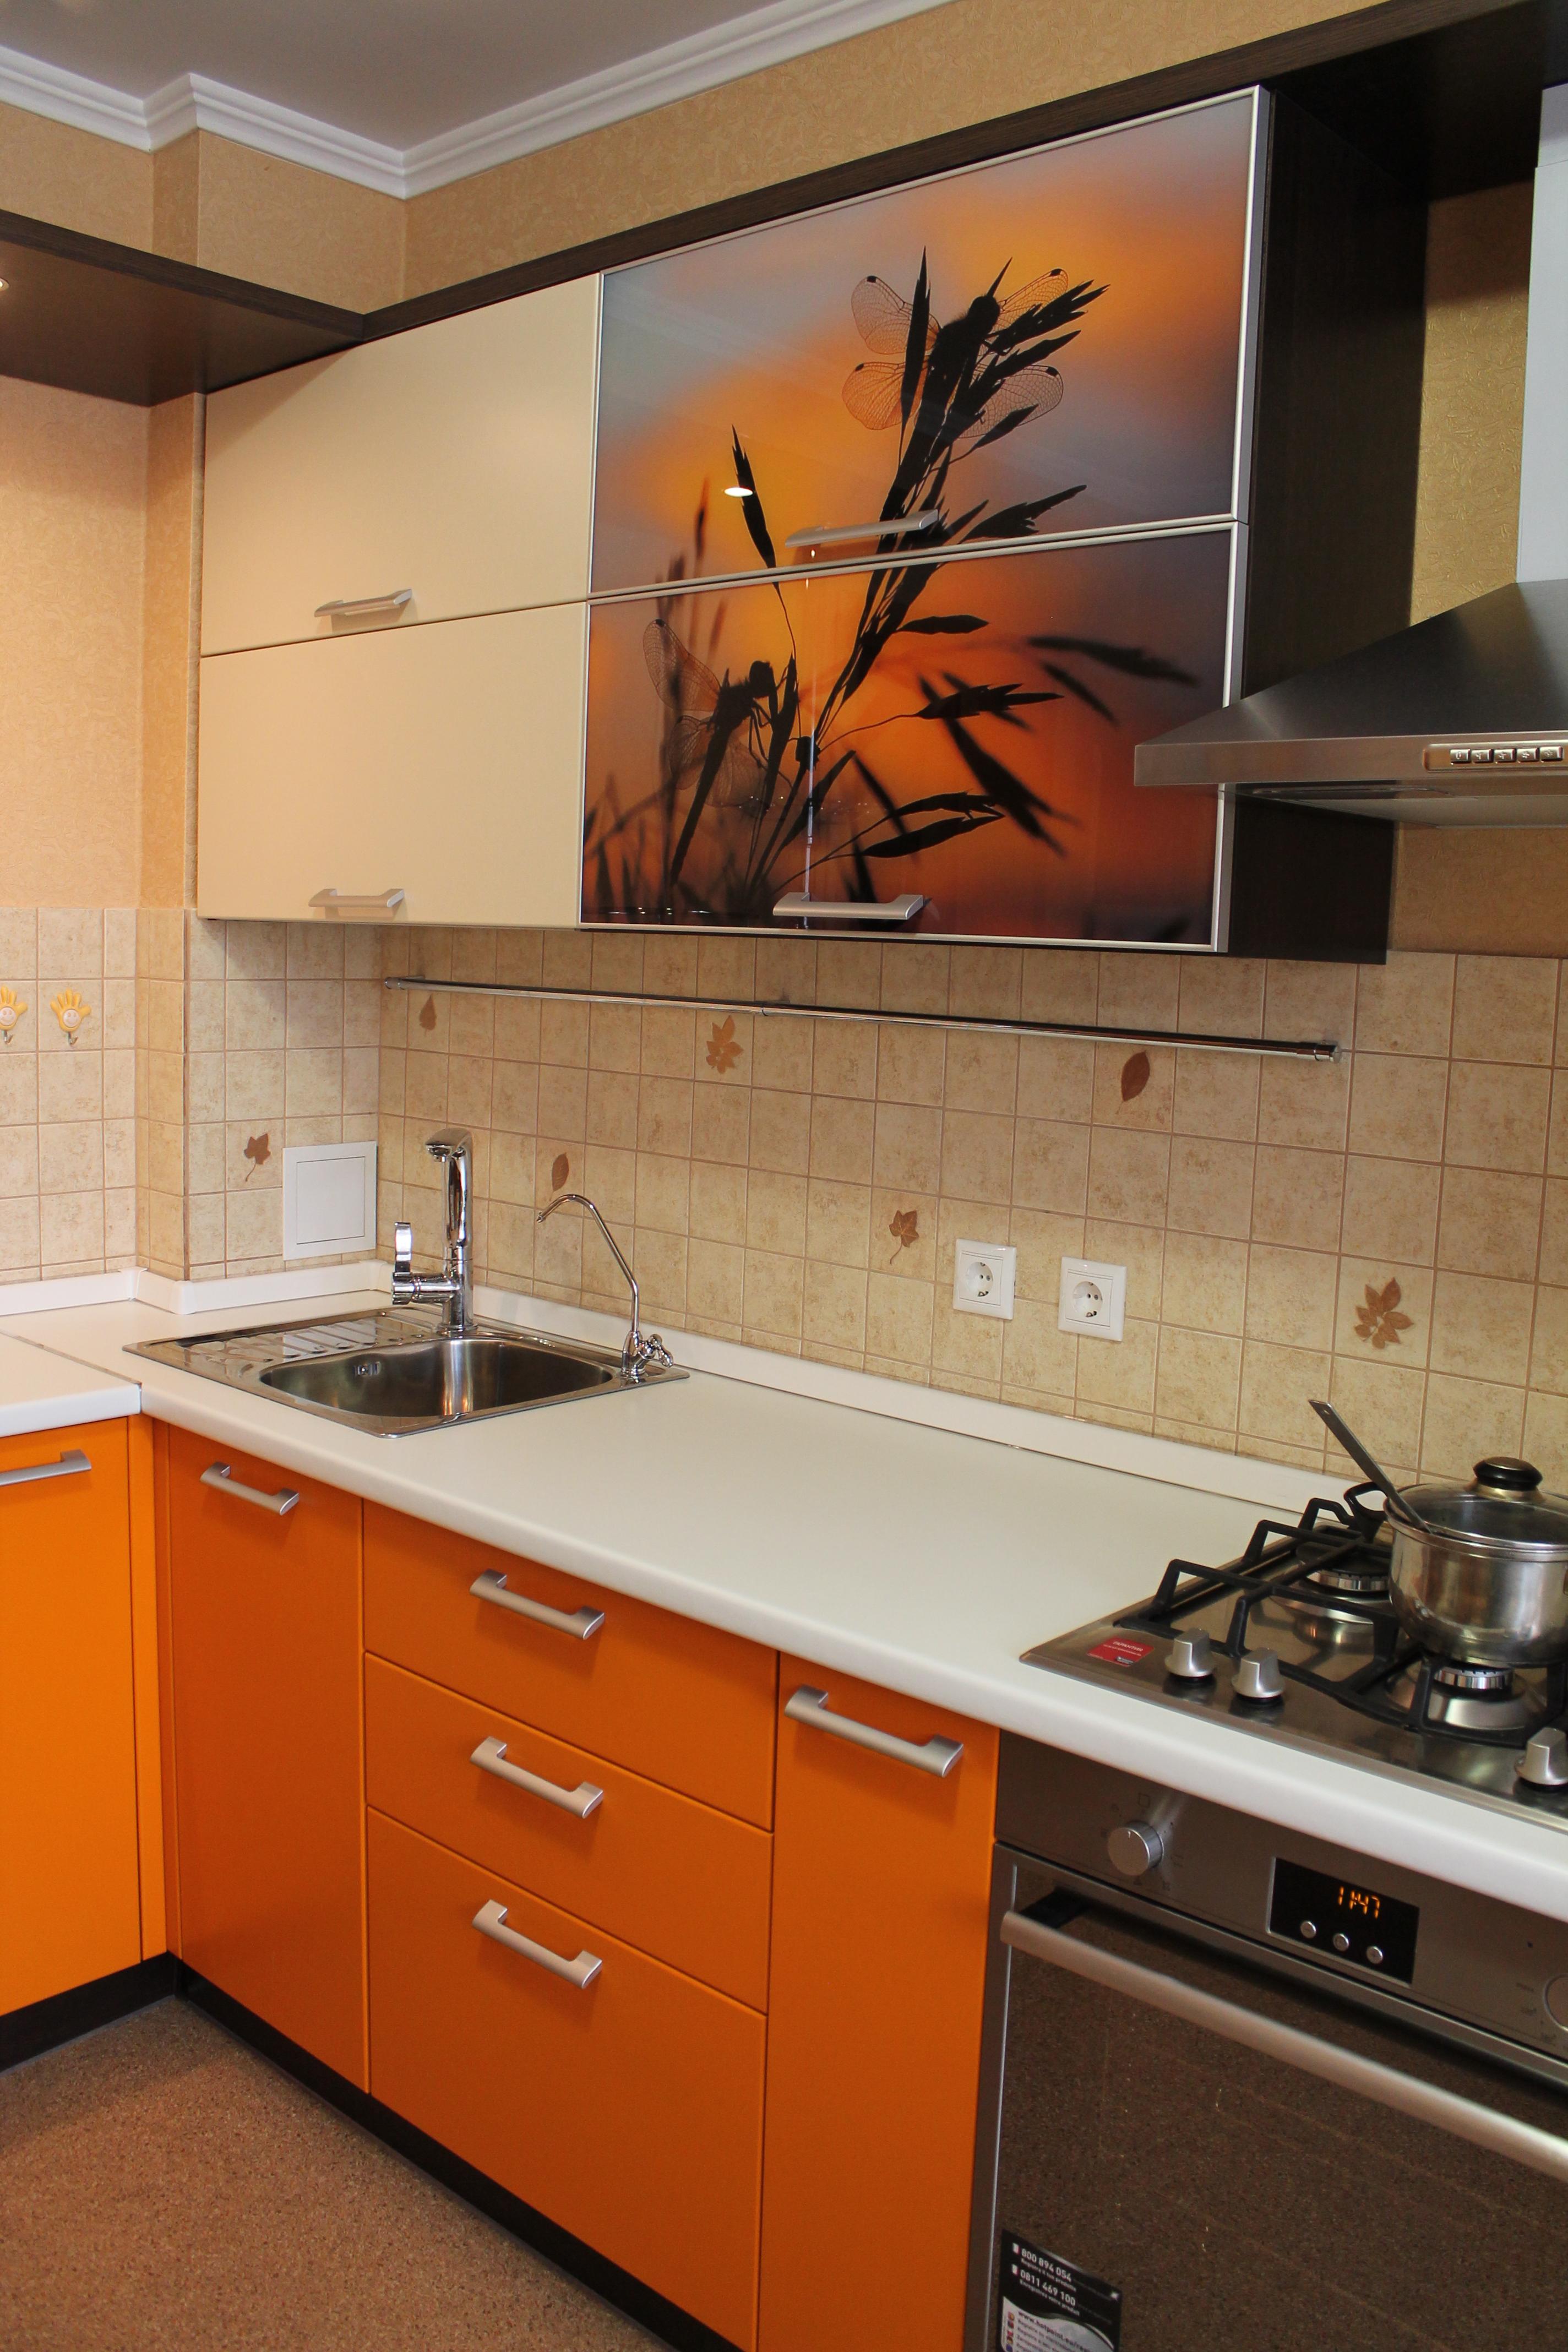 дизайн красной кухни чебоксары.JPG